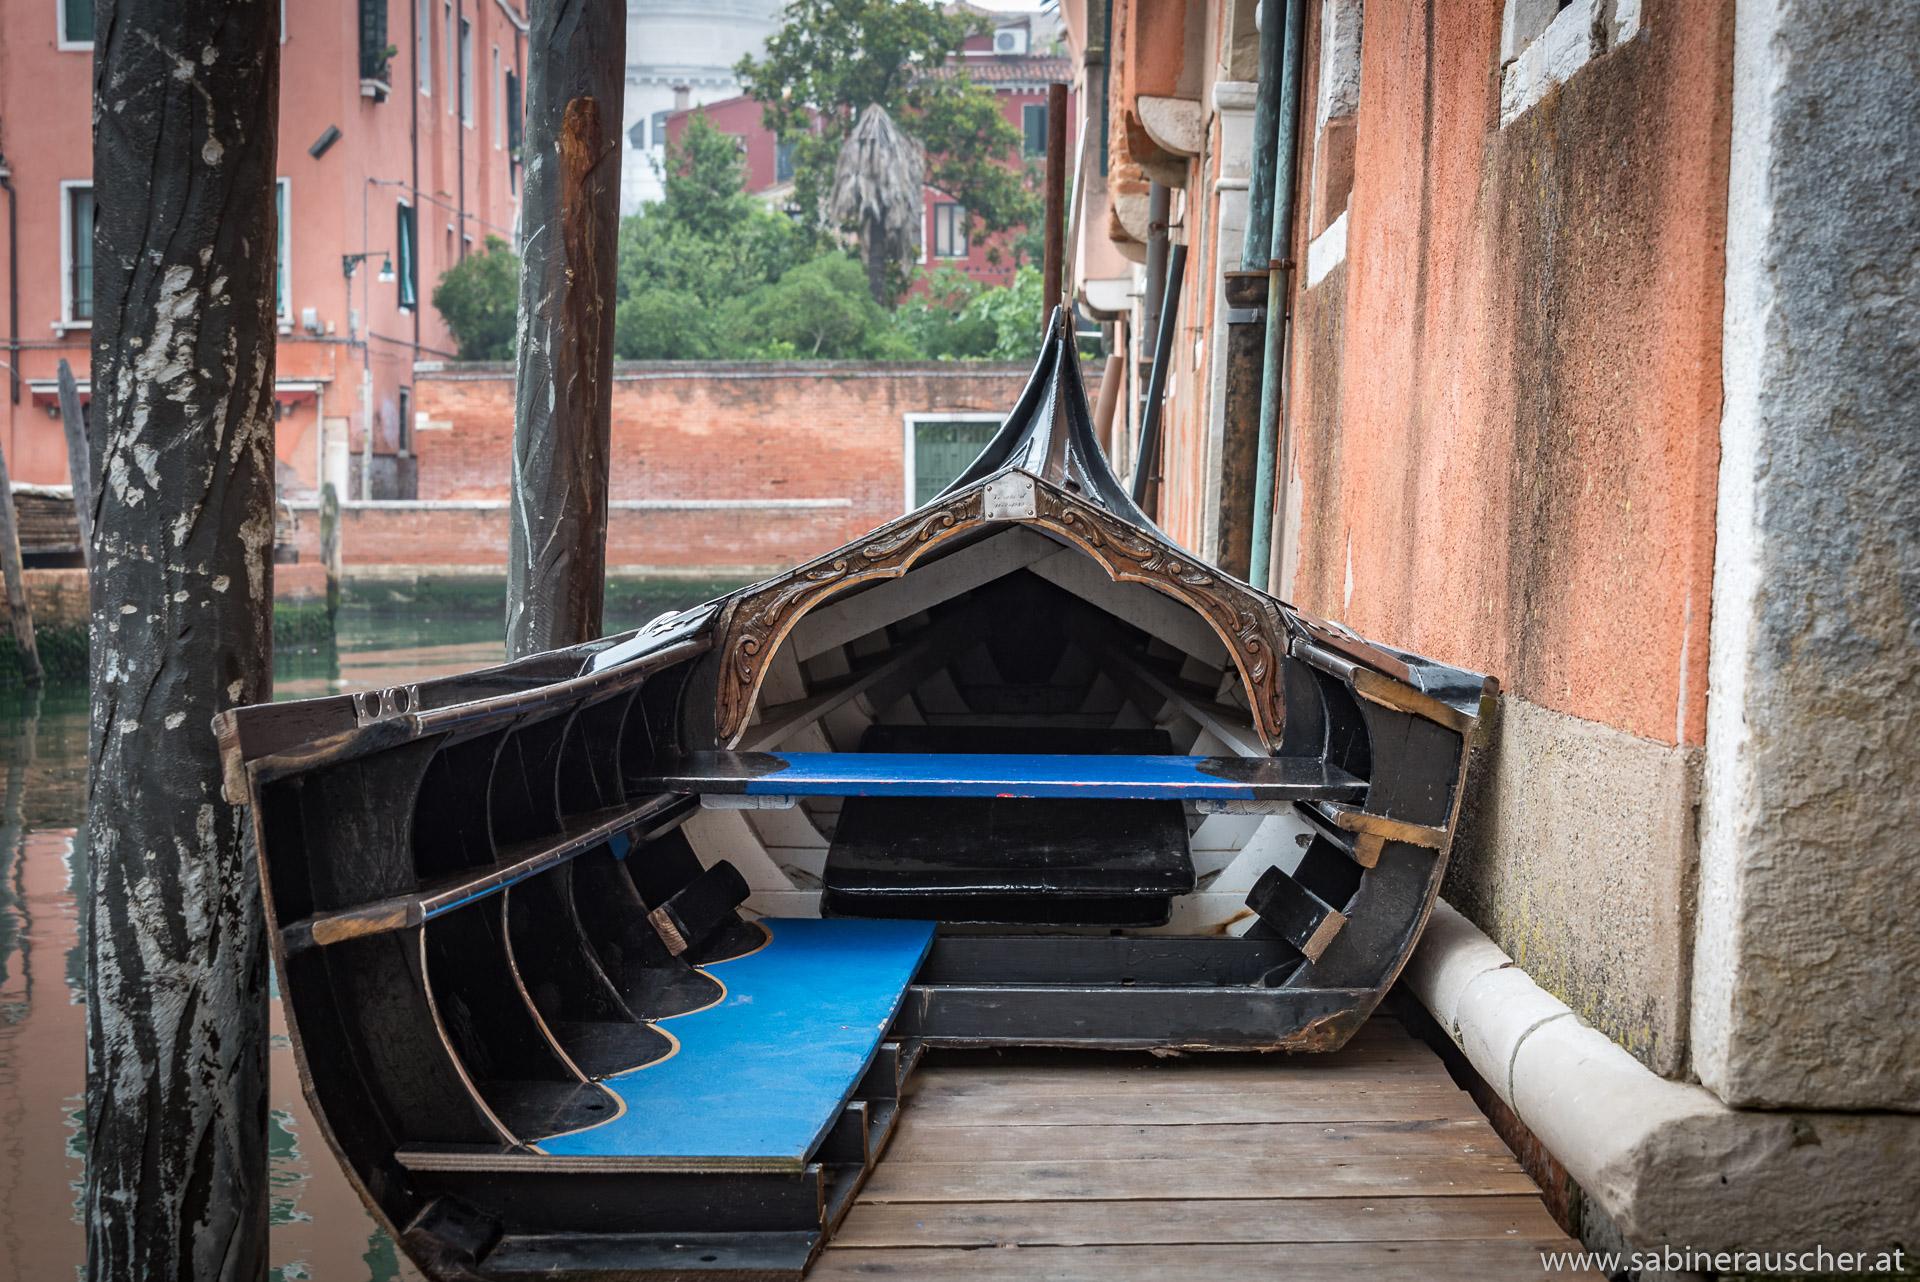 Venice - a cross section of a gondola | Venedig - das Gondelinnere zur Ansicht